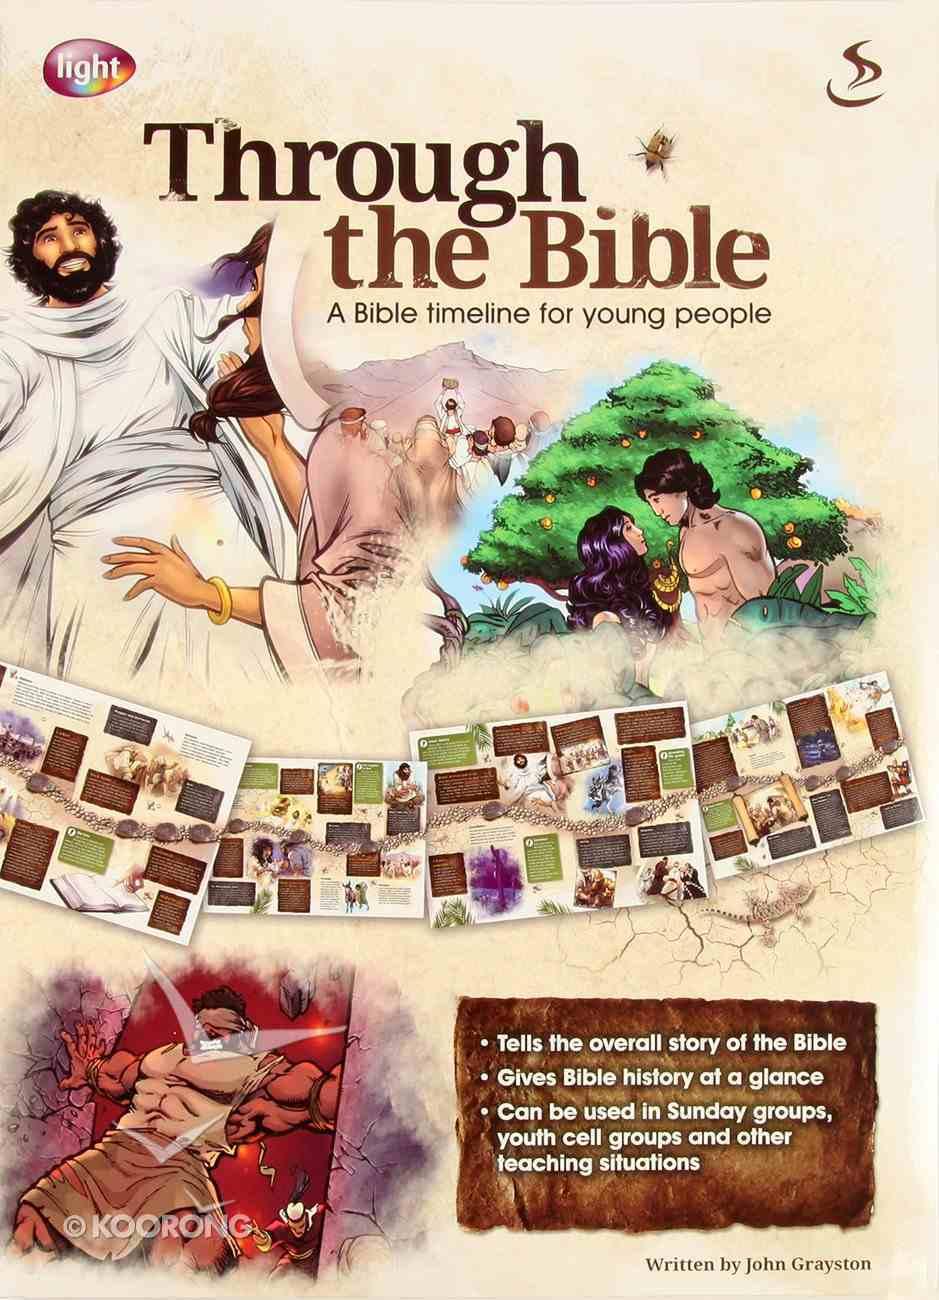 Through the Bible (Timeline Frieze) Chart/card